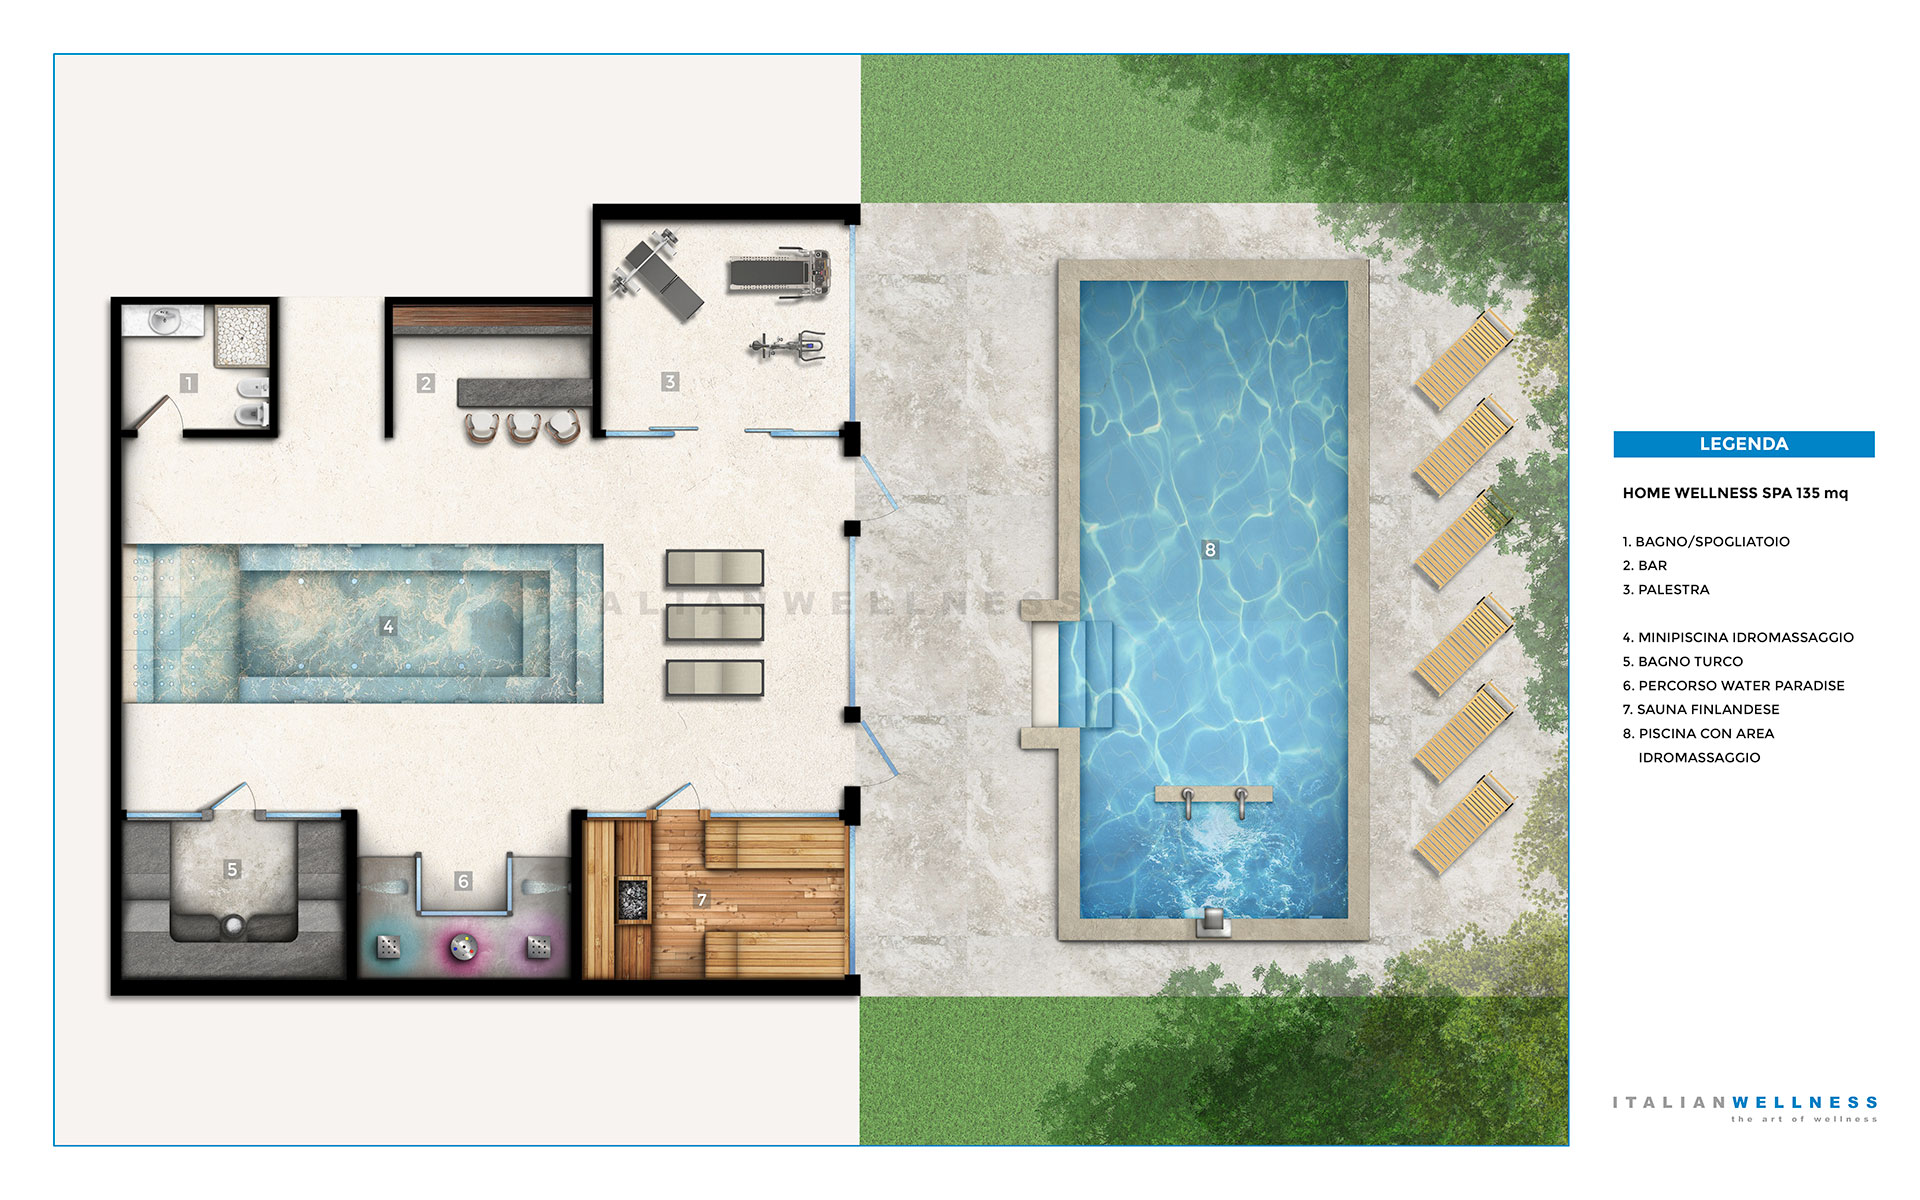 Costruire palestra in casa for Costruire una sauna in casa